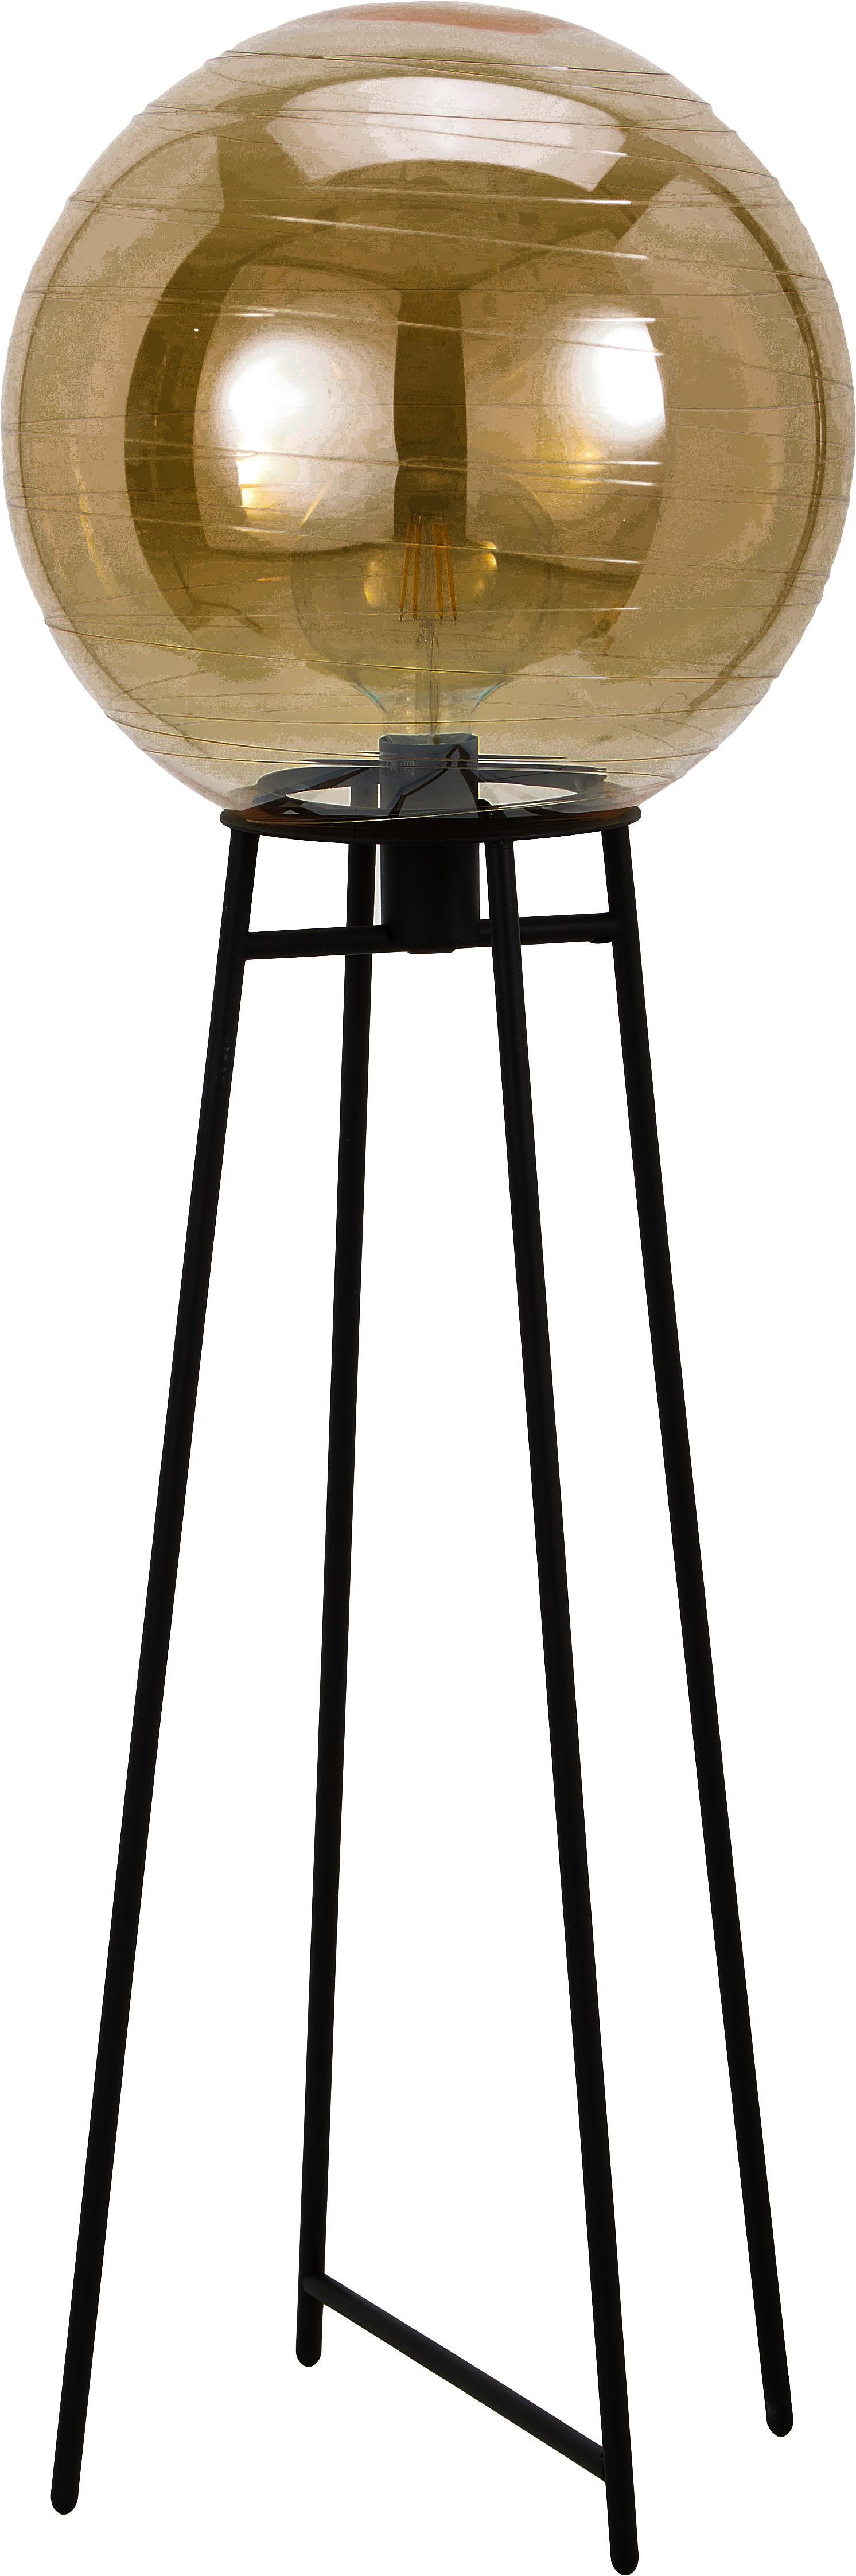 Vloerlamp Lantaren van glas, Lampenkap: glas, Lampvoet: gelakt metaal, Amberkleurig, zwart, Ø 37 x H 117 cm